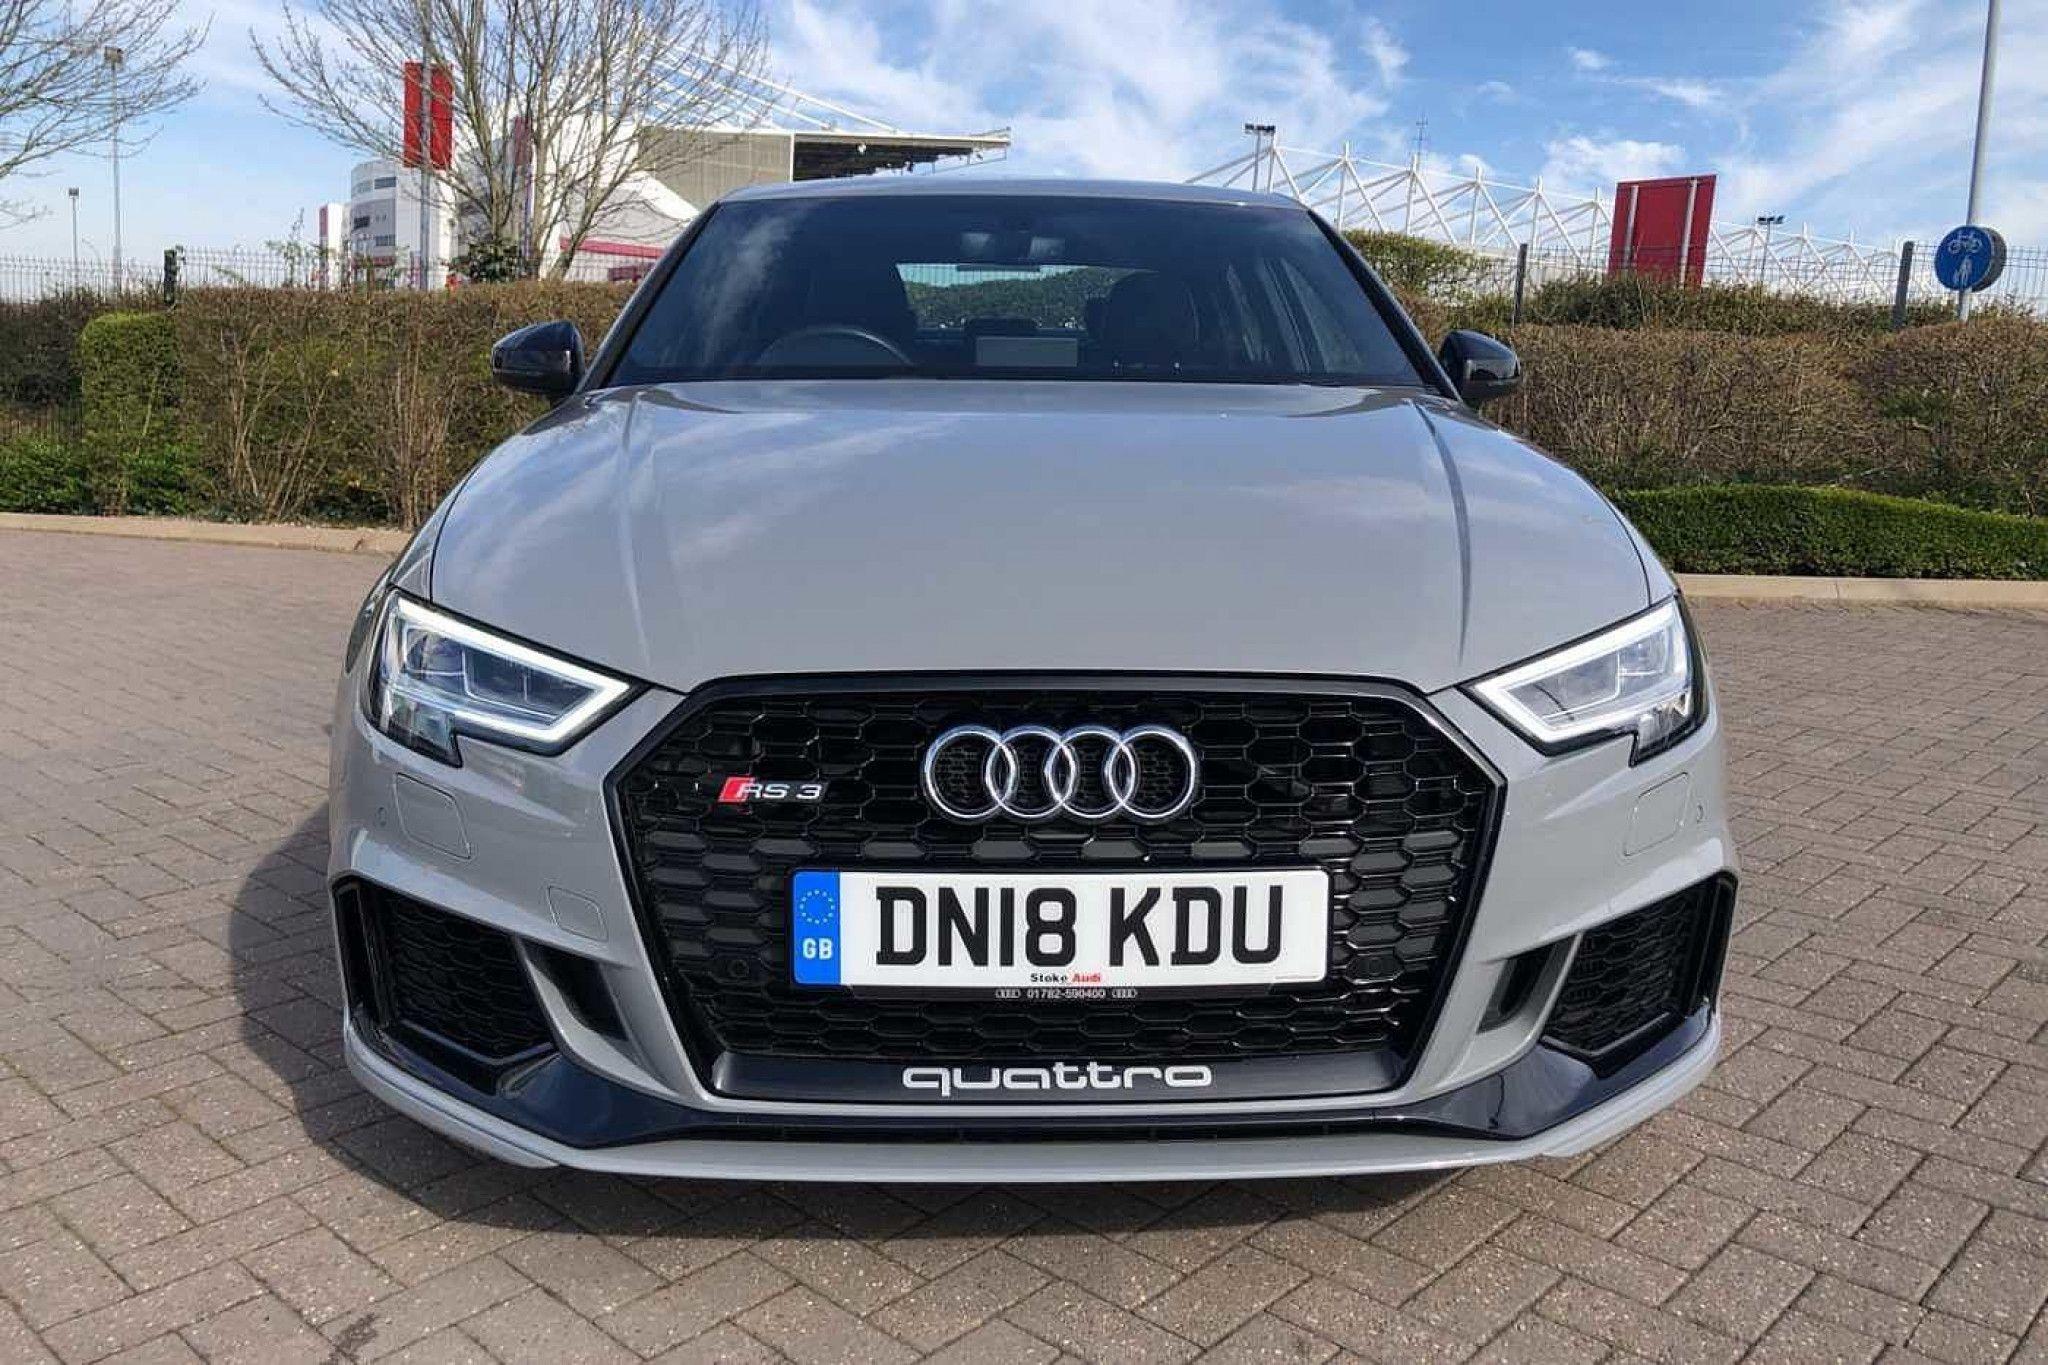 Audi Rs3 2 5 Tfsi Rs 3 Quattro 4dr S Tronic In 2020 Audi Rs3 Classic Car Insurance Audi